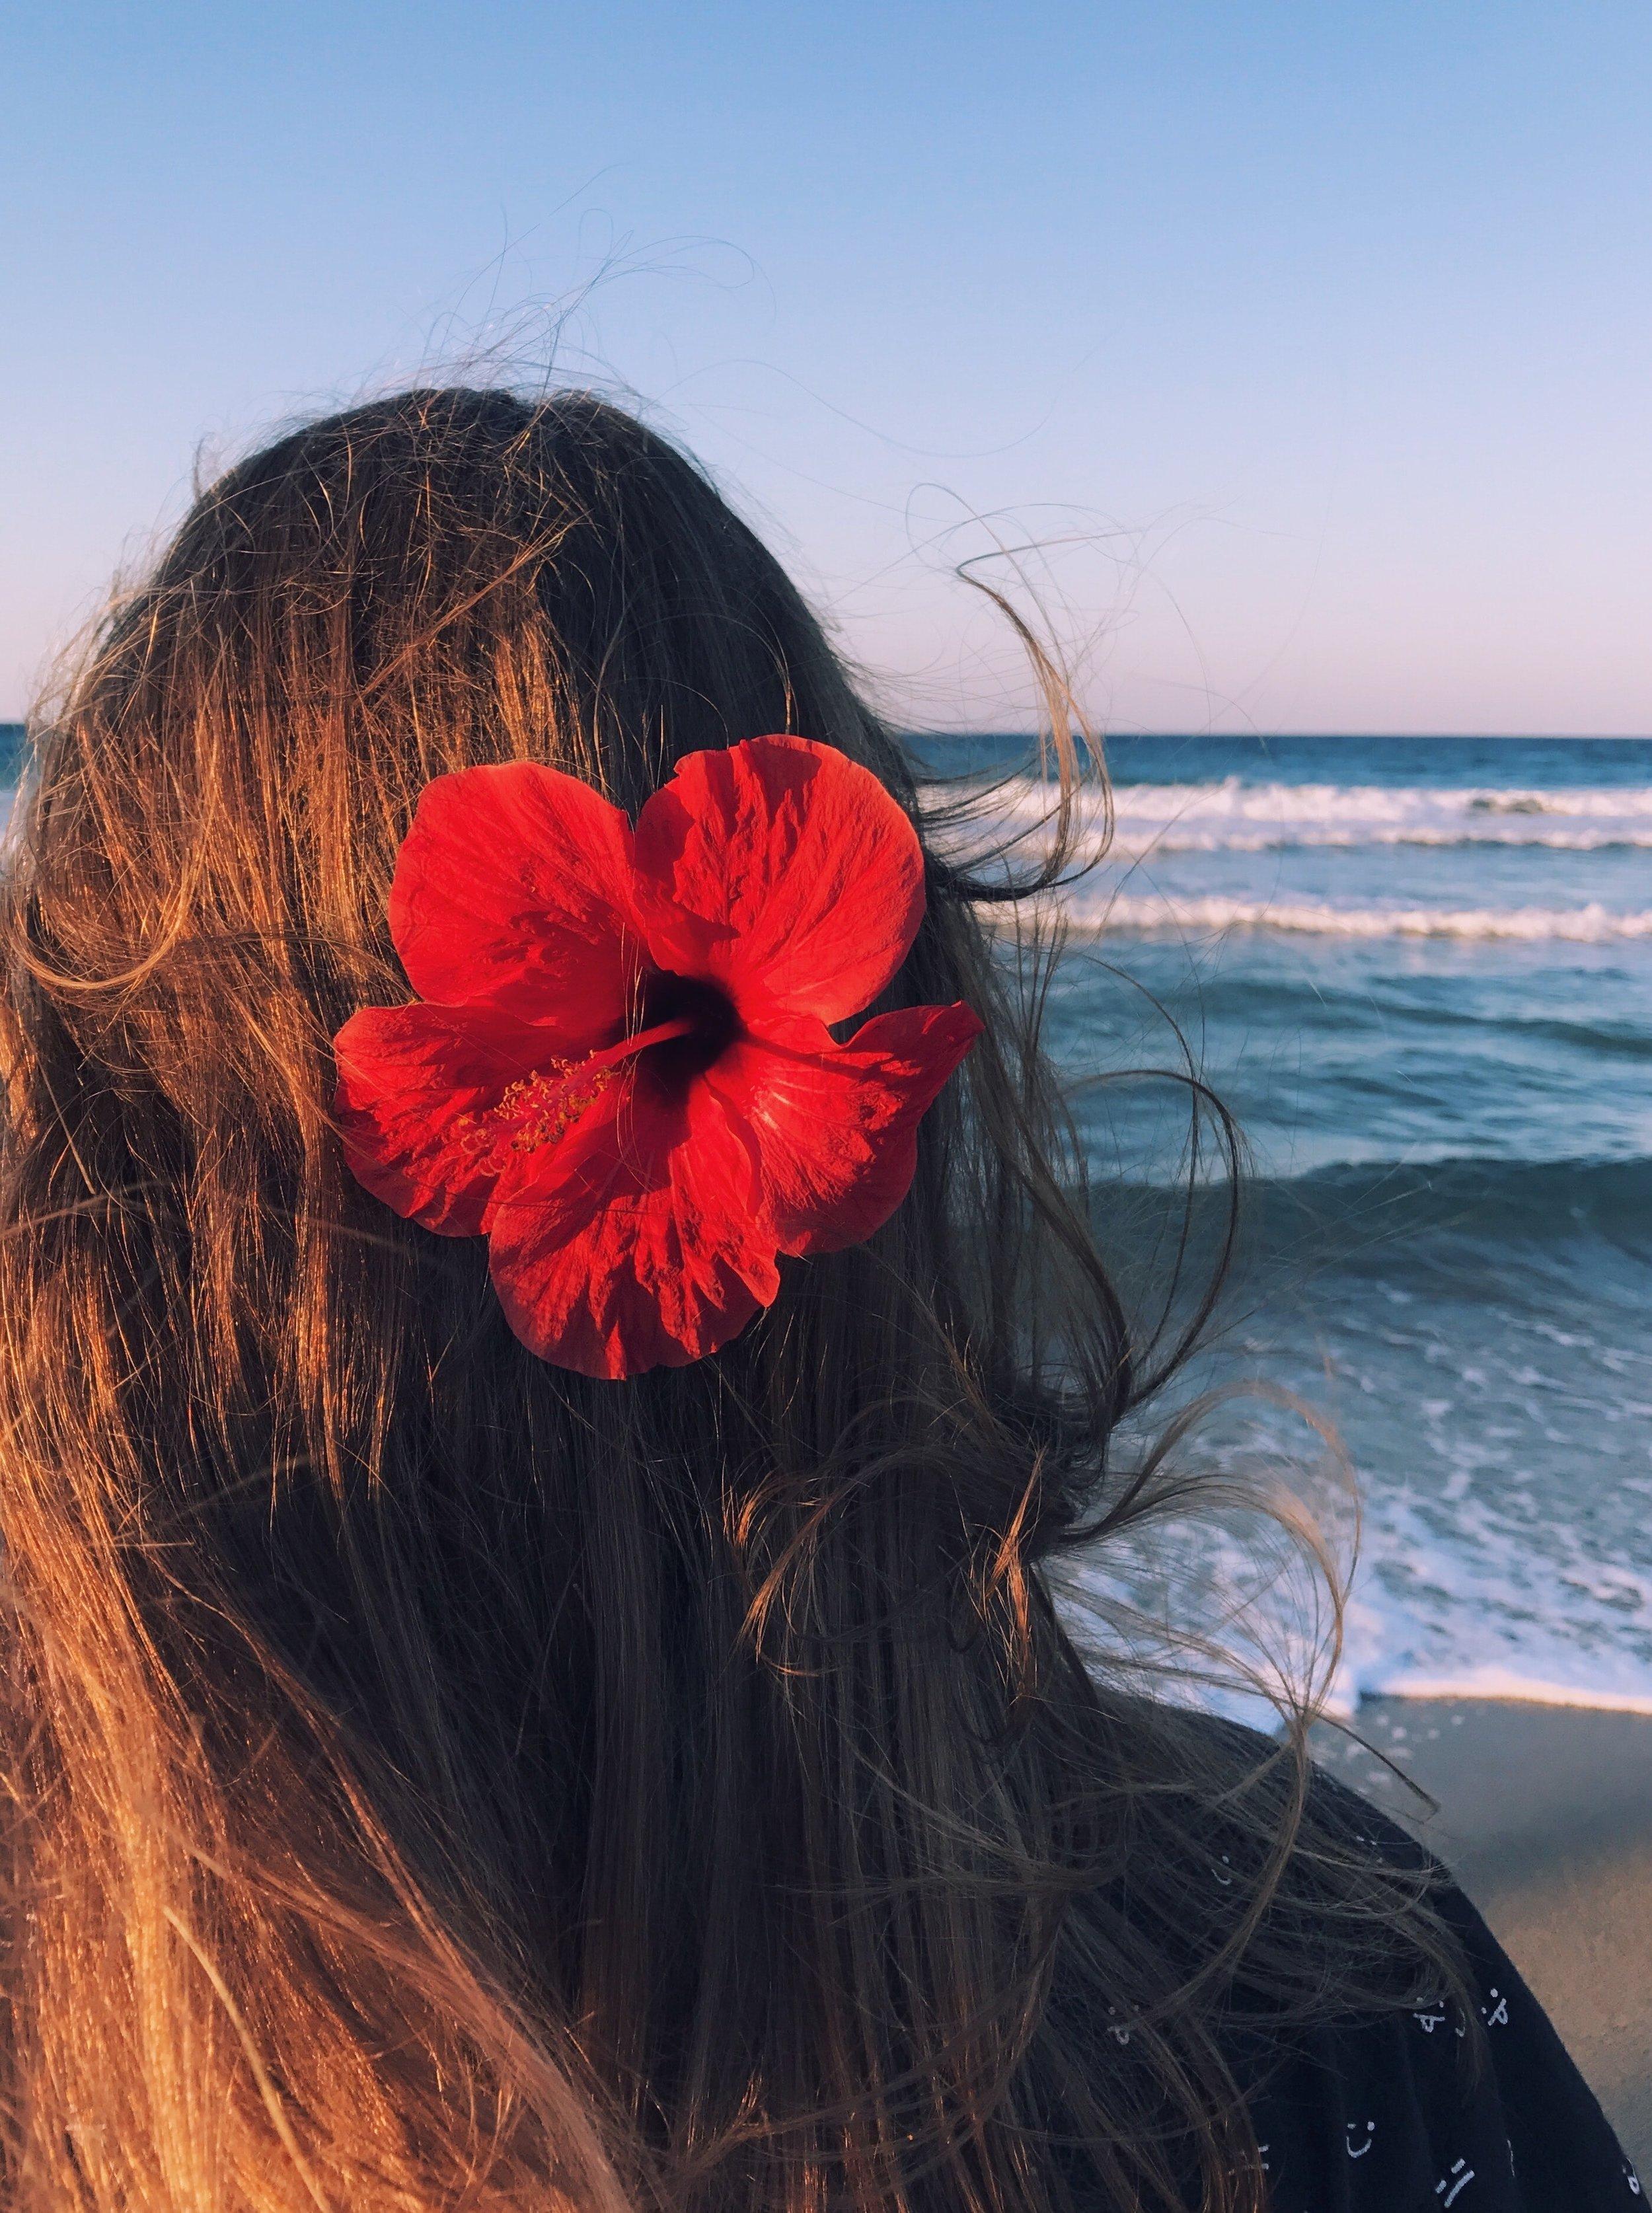 back-view-beach-beautiful-812945.jpg